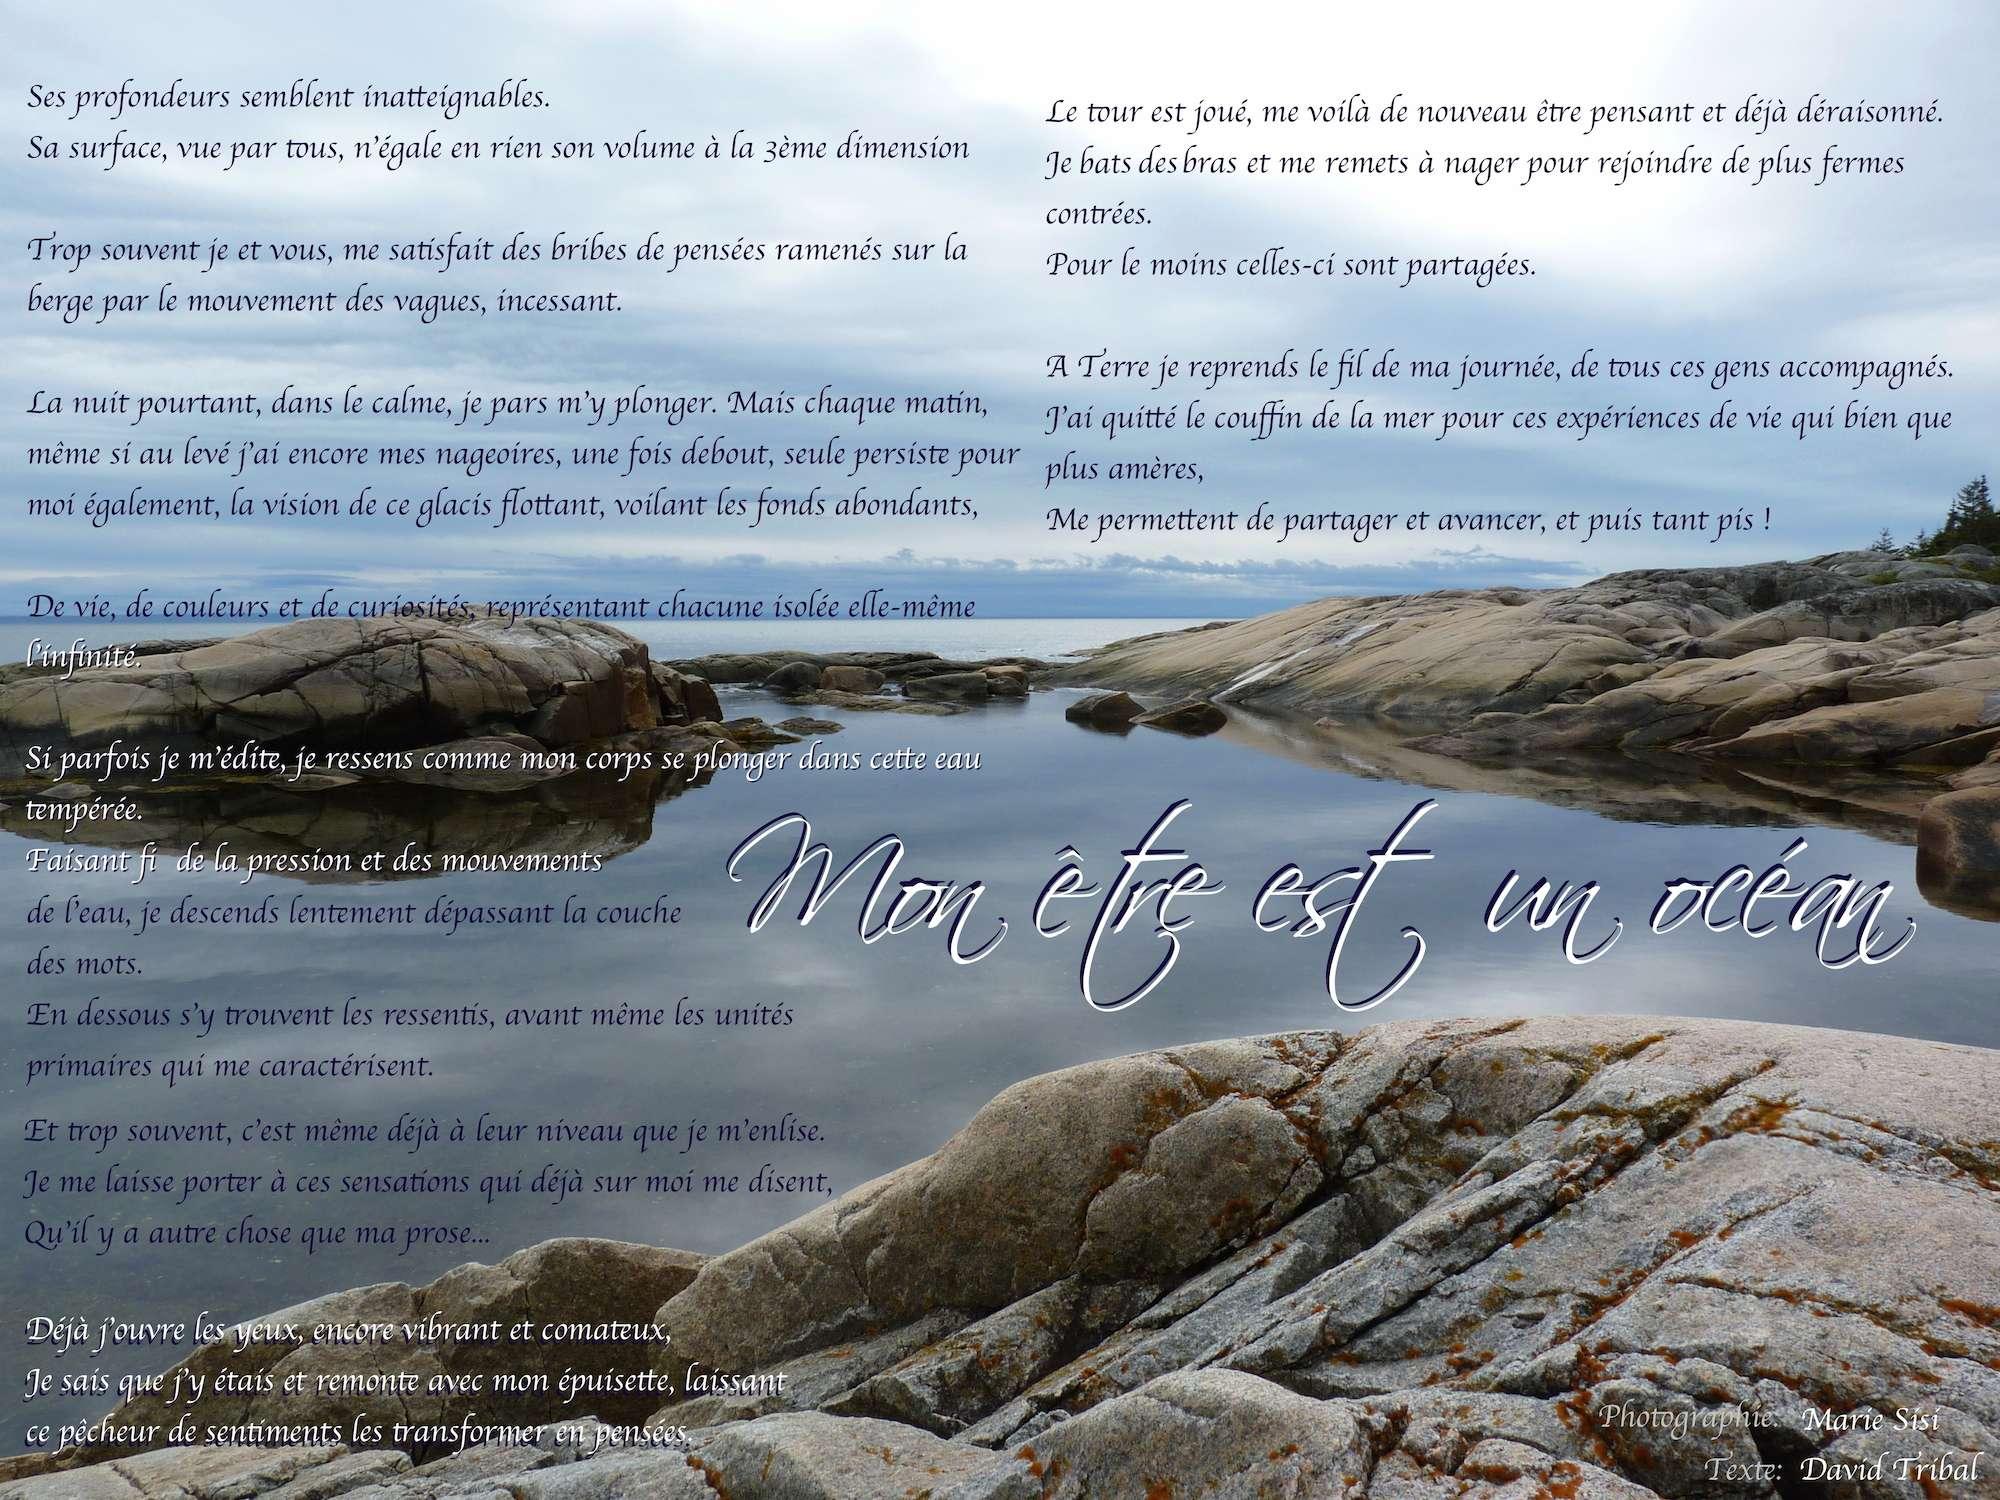 DavidTribal_Cailloux-mer-marieSiSi-P1020435-Poeme_2000s